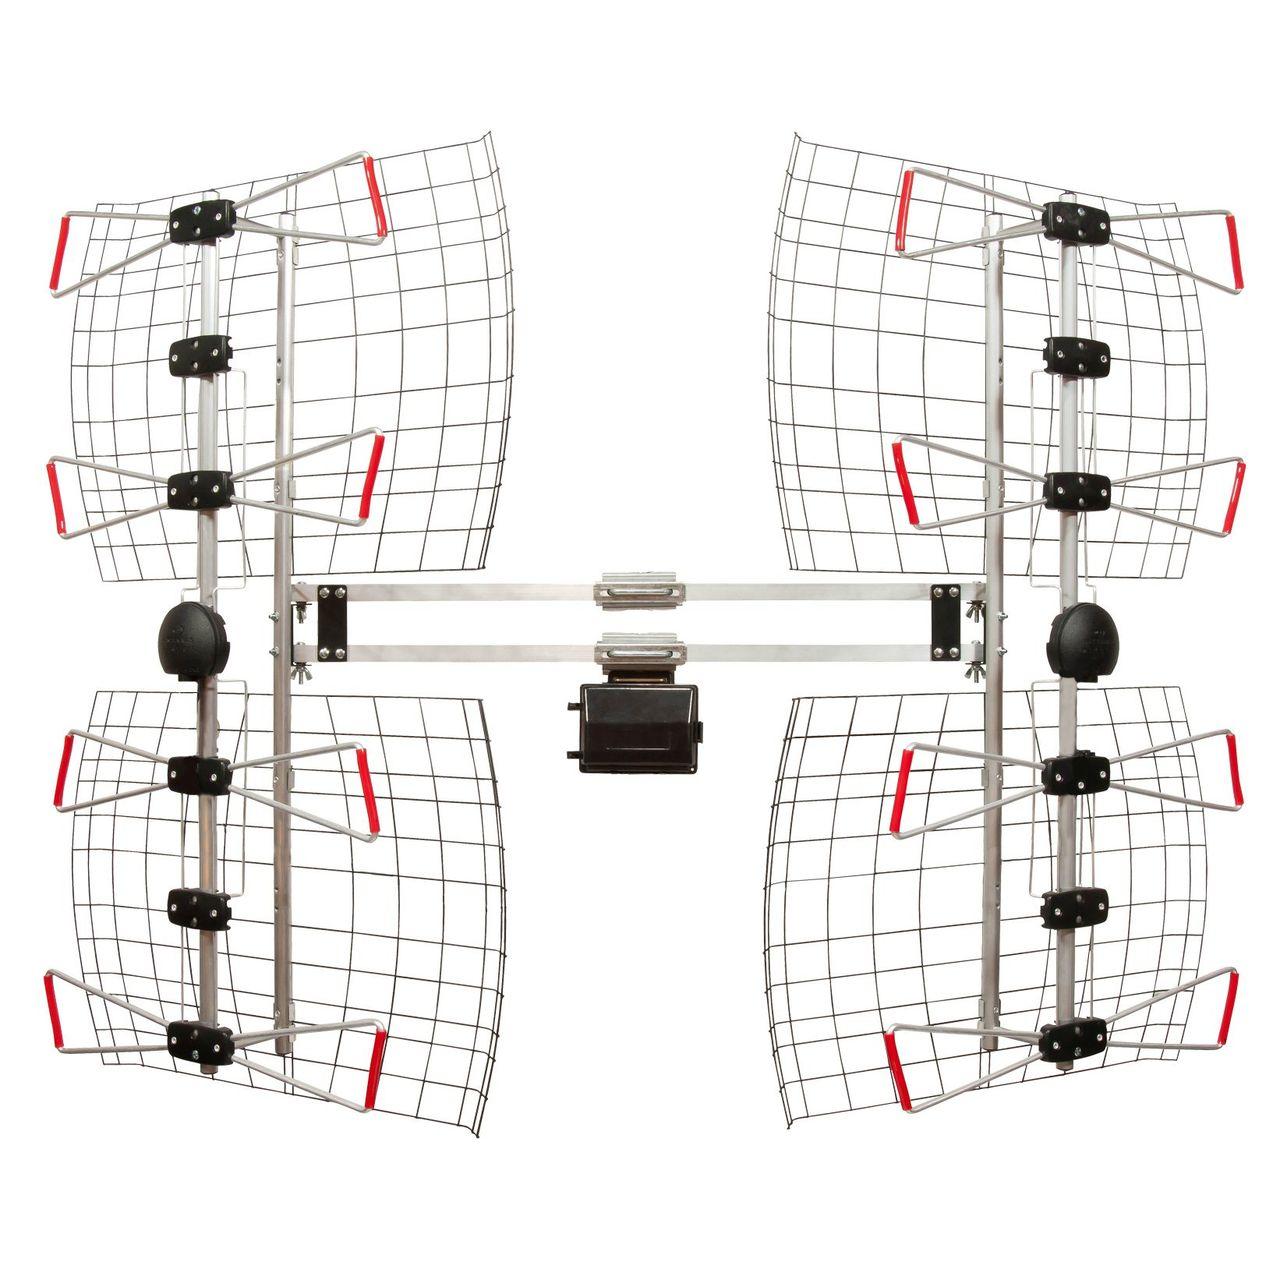 https://www.antennasdirect.com - DB8e Extreme Long Range Bowtie HDTV Antenna